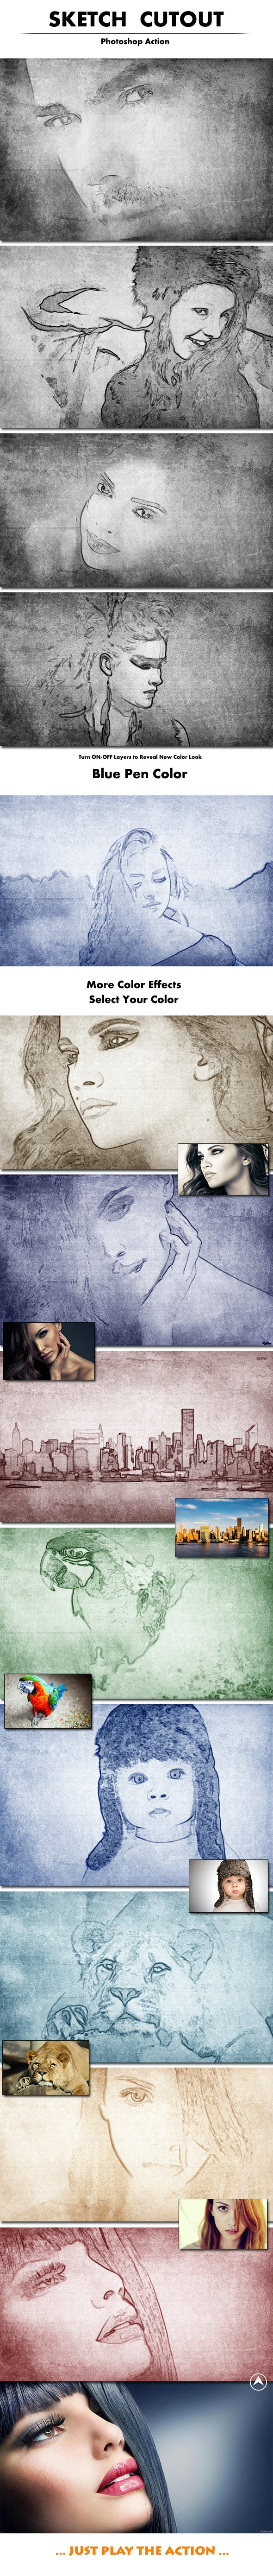 Sketch Cutout - Photoshop Add-ons